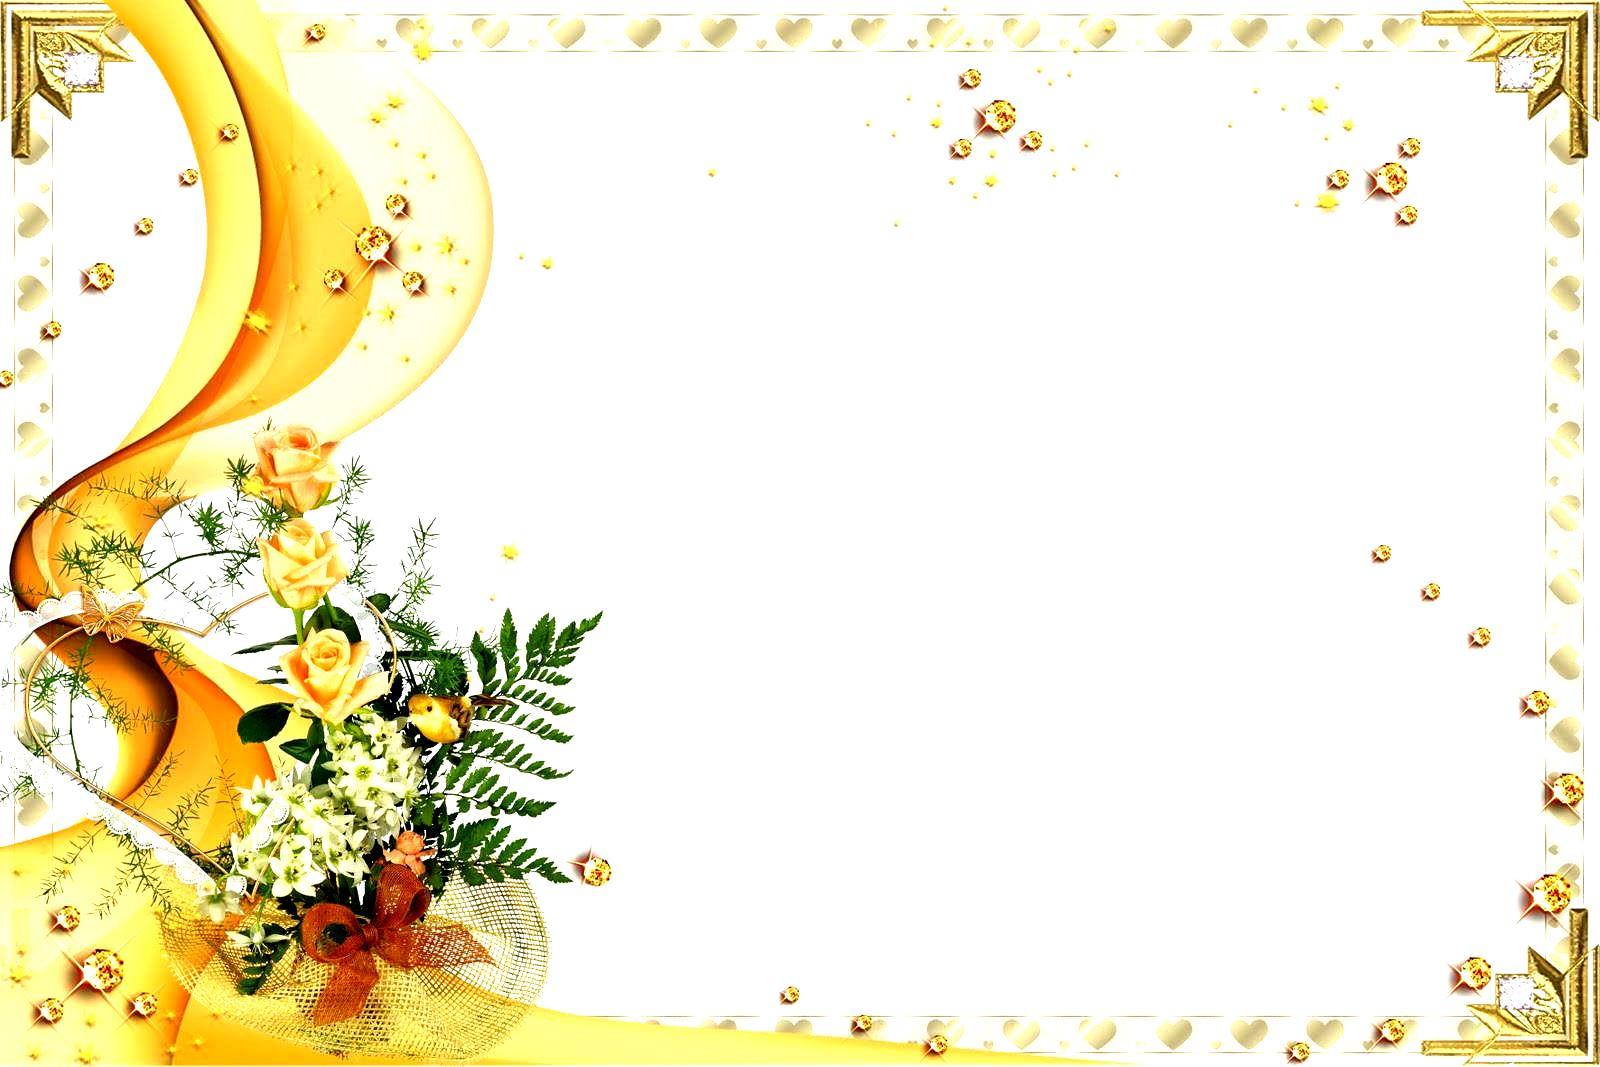 Printable Blank Invitation Templates   Free Invitation Templates - Printable Invitation Templates Free Download